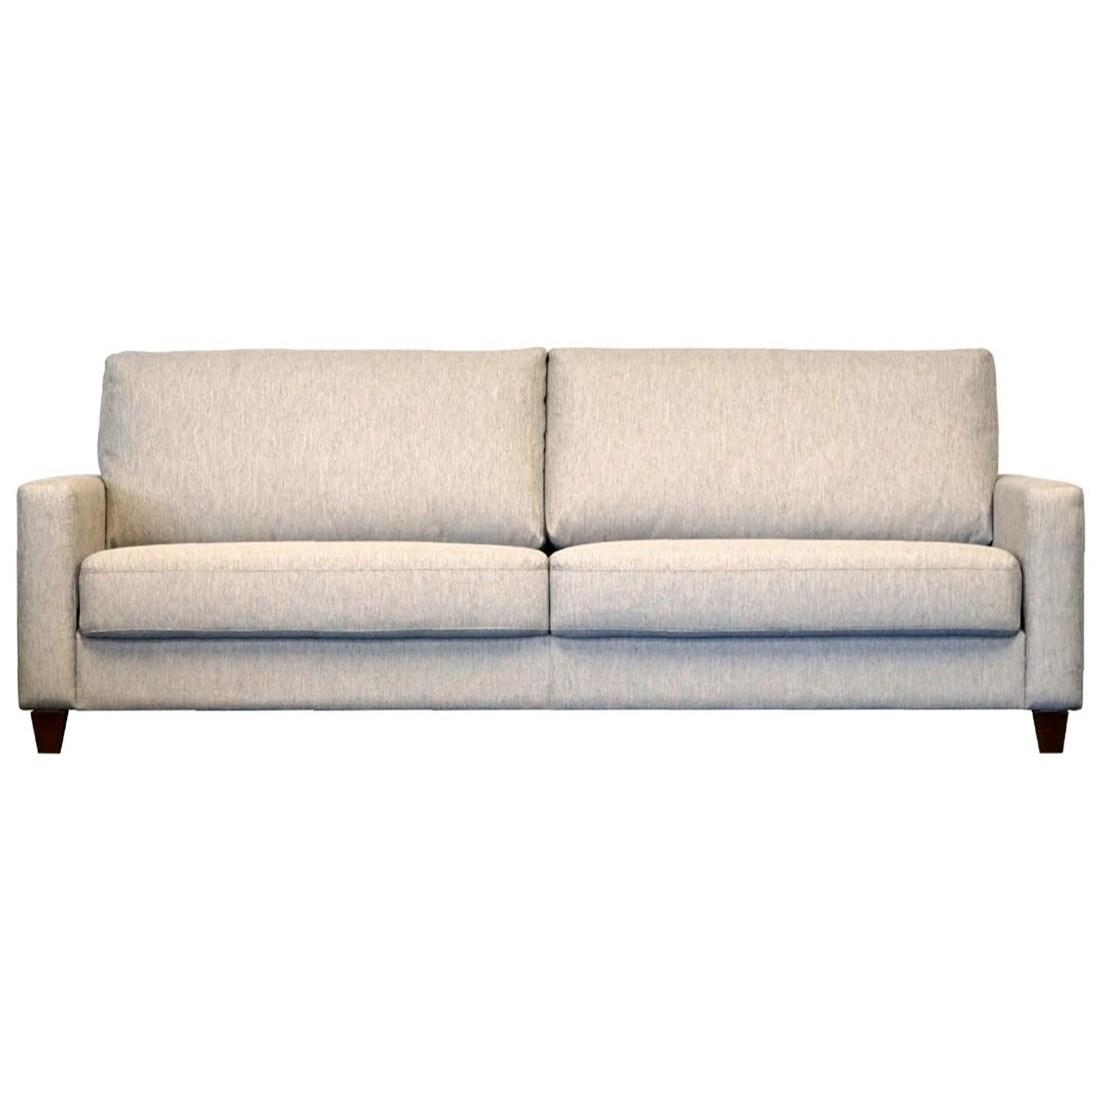 luonto nico nico3m contemporary king size sofa sleeper baer 39 s furniture sleeper sofas. Black Bedroom Furniture Sets. Home Design Ideas